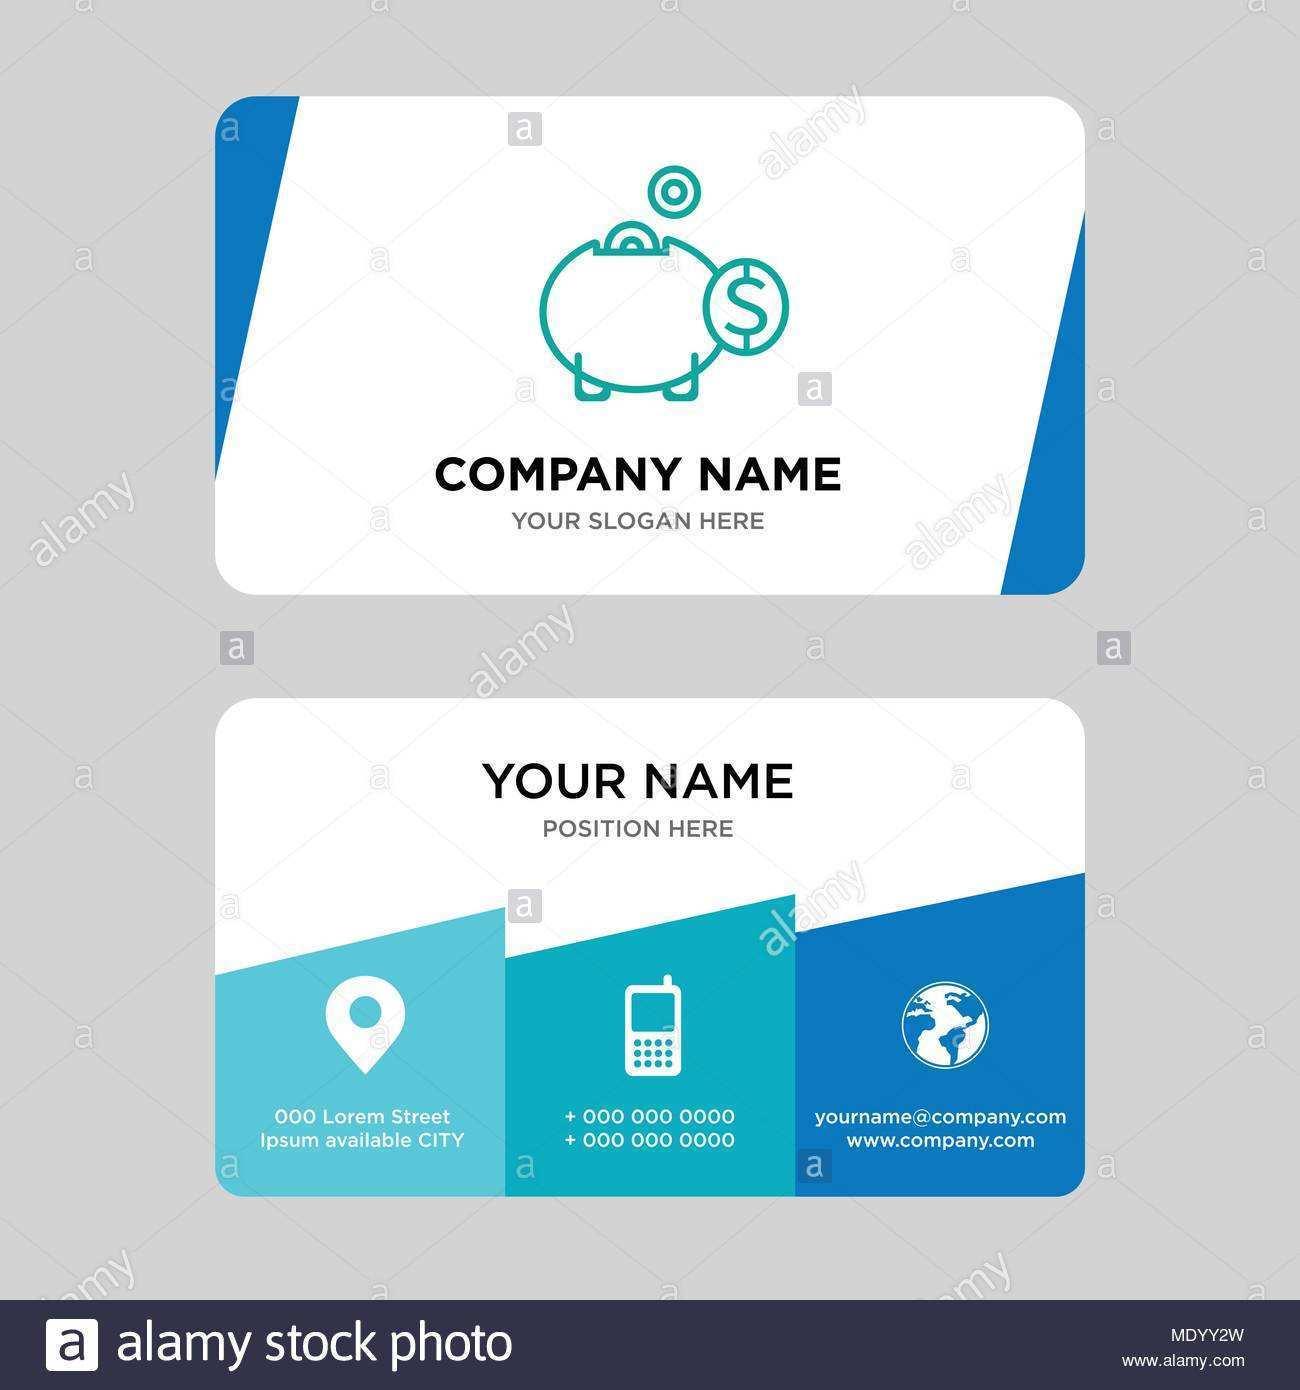 83 Creative Business Card Box Illustration Template PSD File for Business Card Box Illustration Template